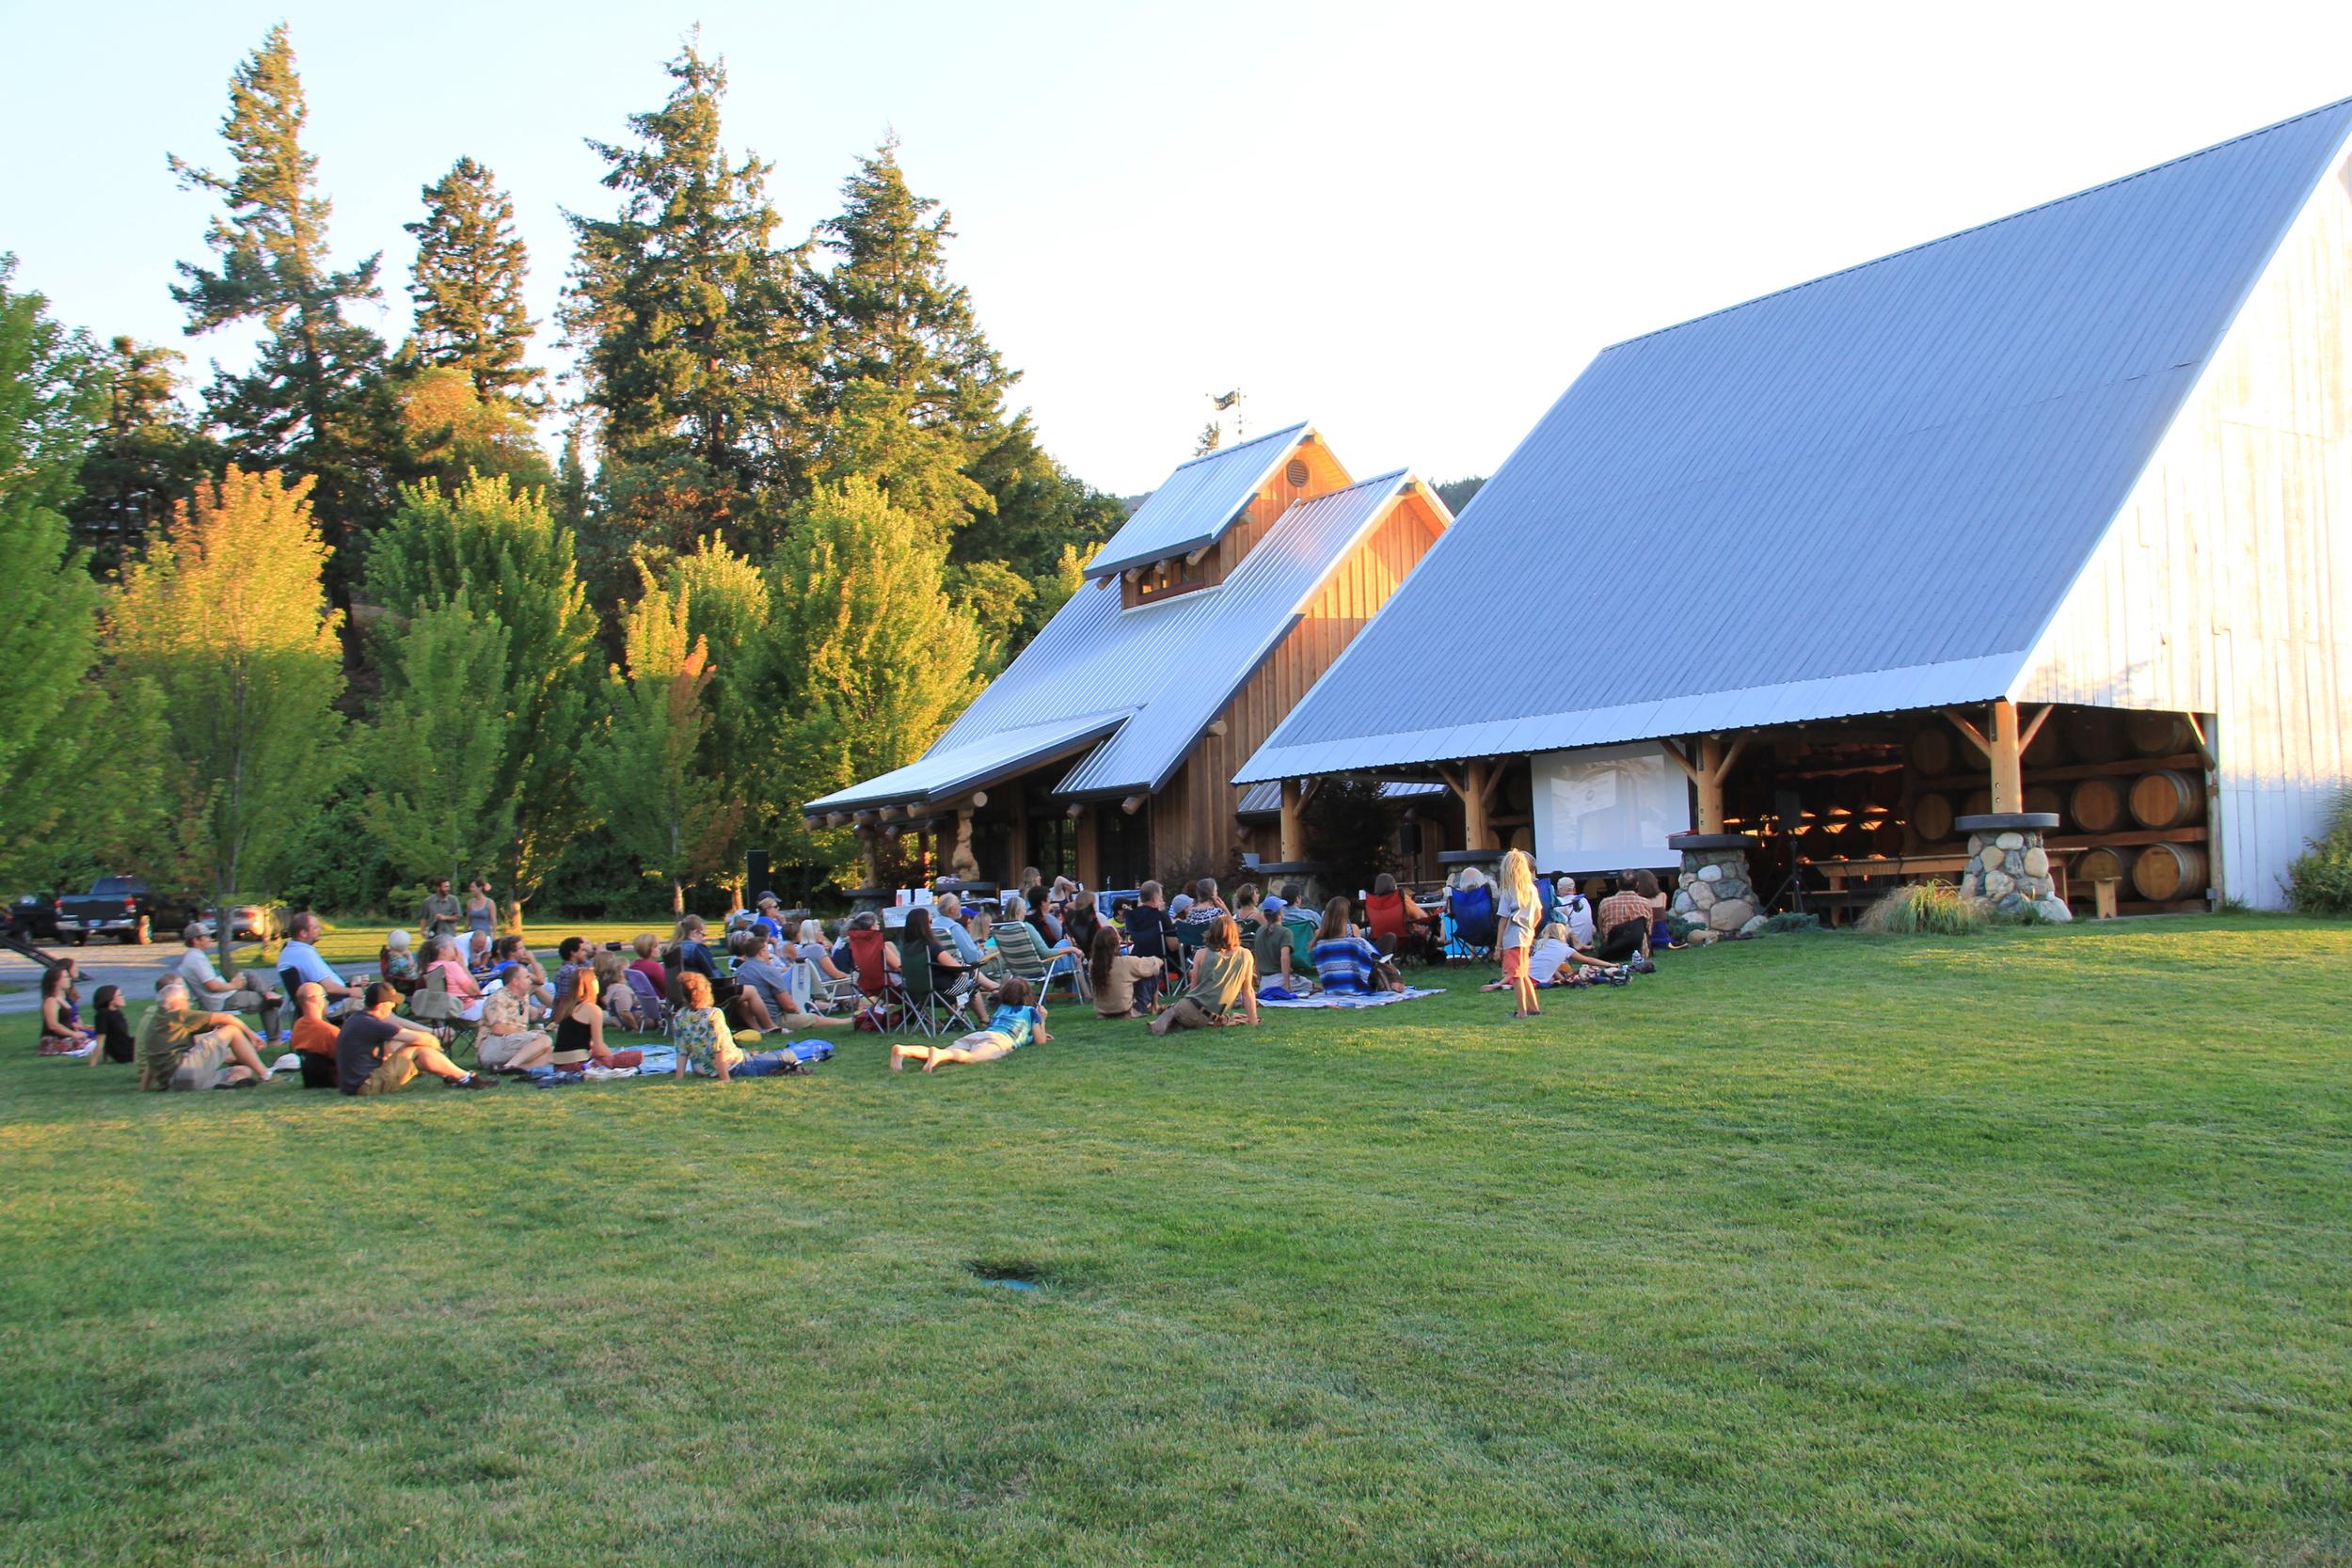 An outdoor screening